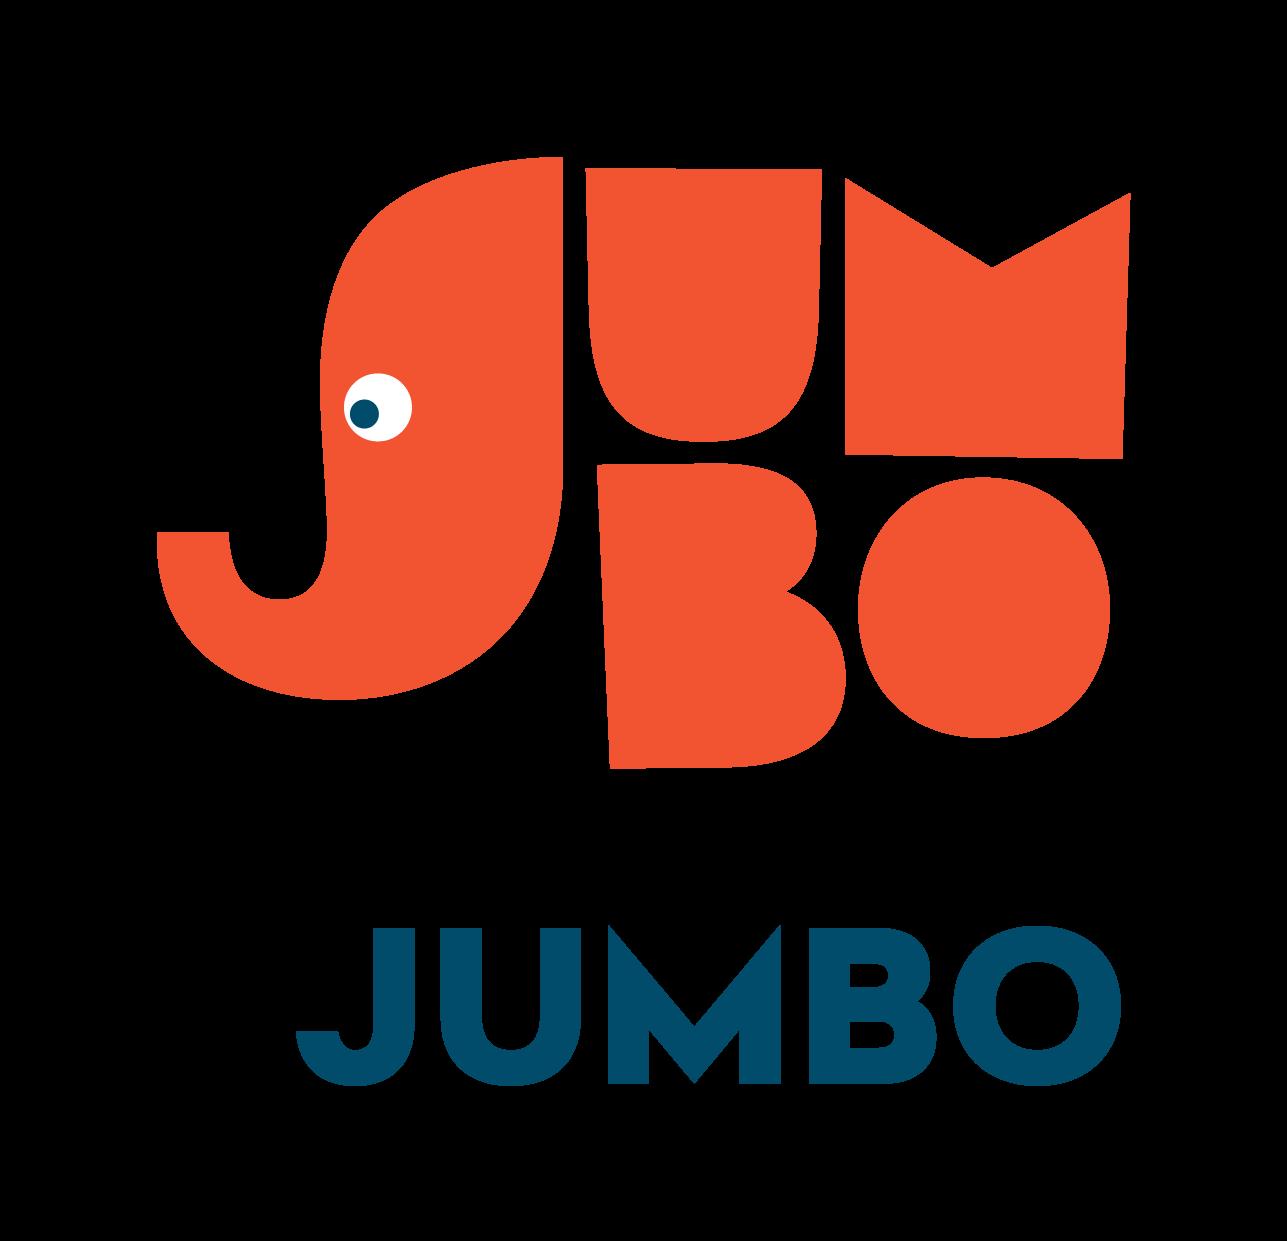 Jumbo Interactive Limited (JIN:ASX) logo